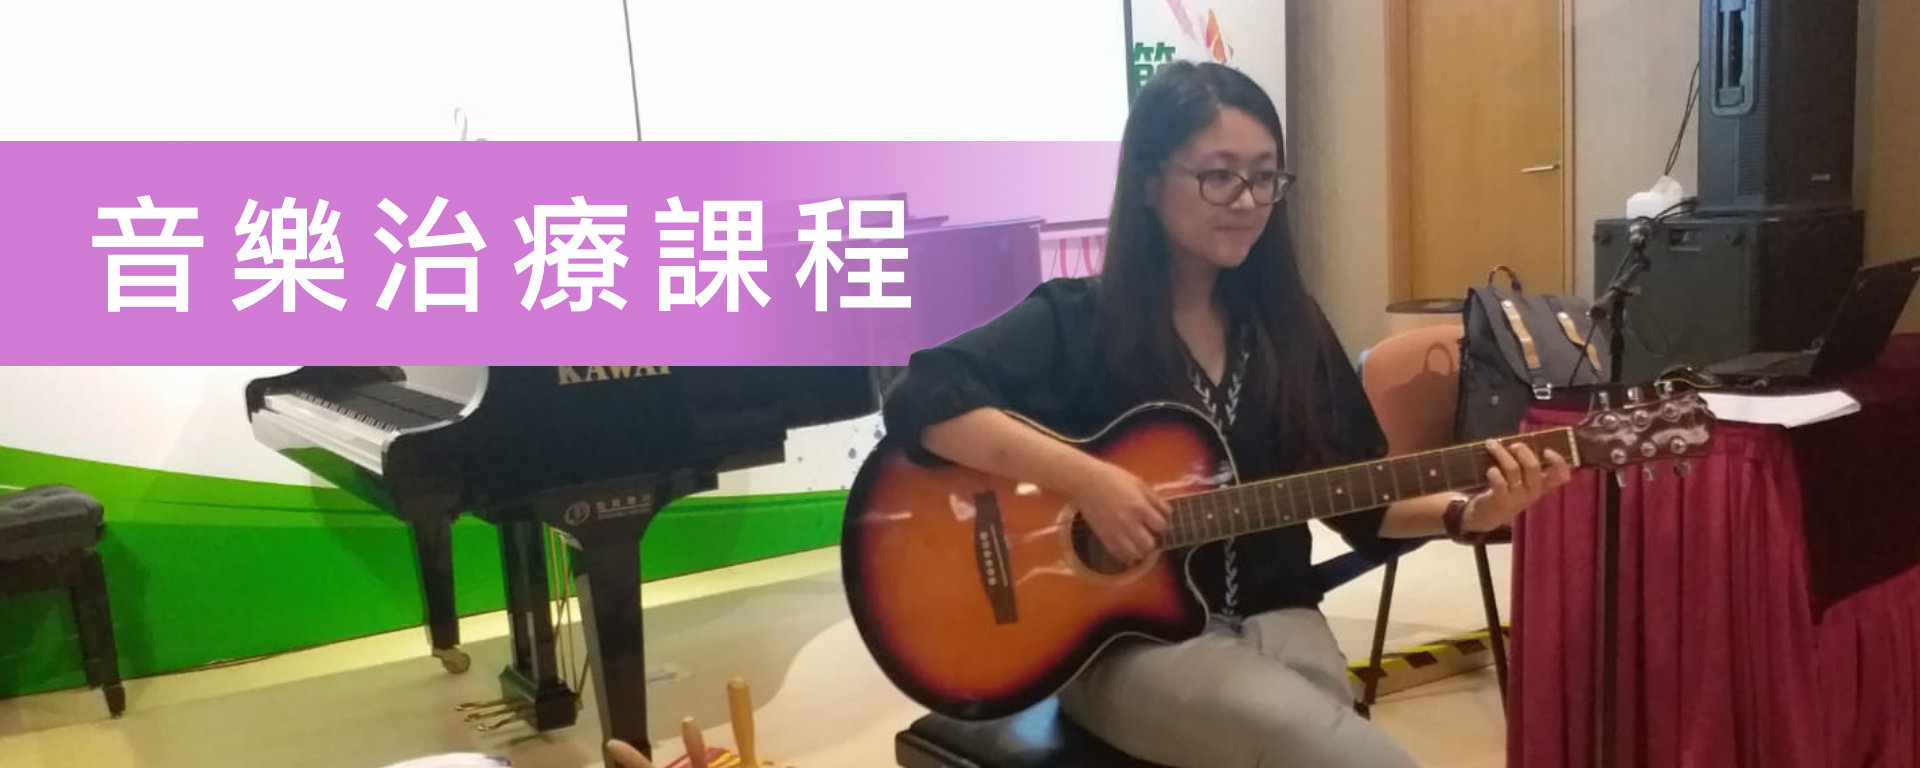 音樂治療課程 – 香 港 音 樂 教 育 家 協 會 | Hong Kong Association for Music Educators